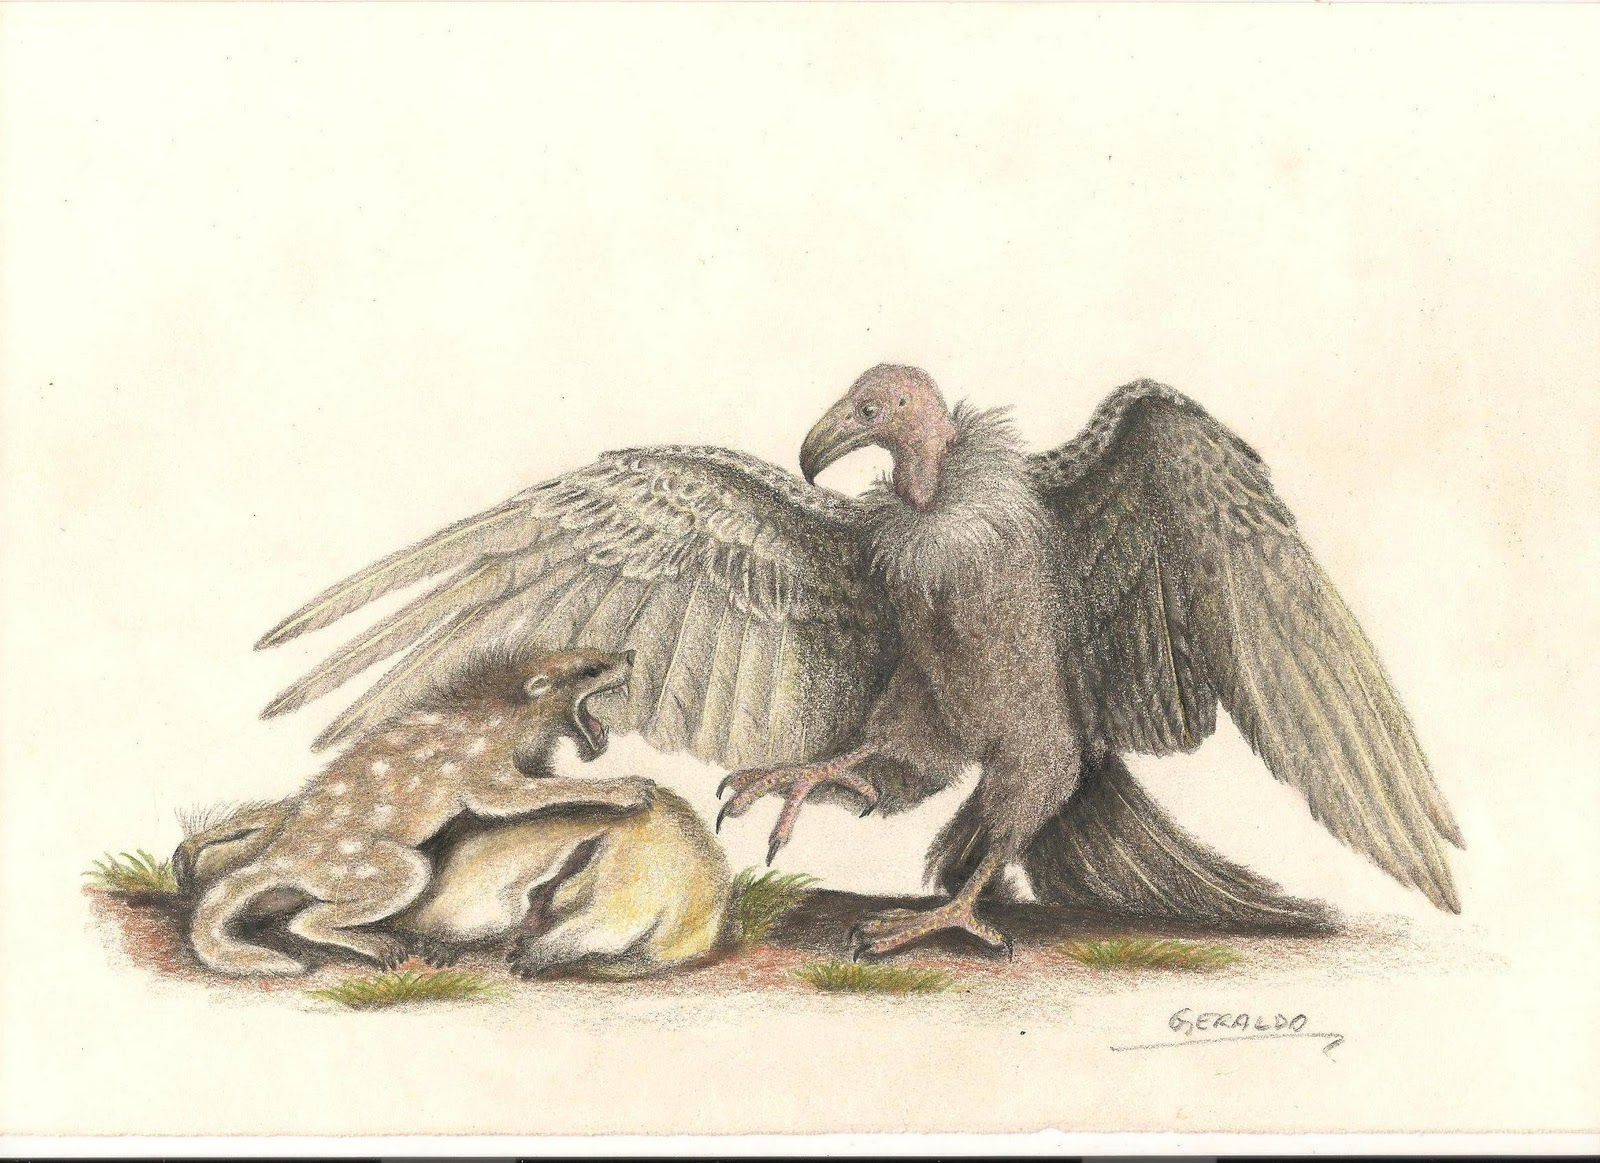 Taubatornis campbelli (Geraldo de França Jr)